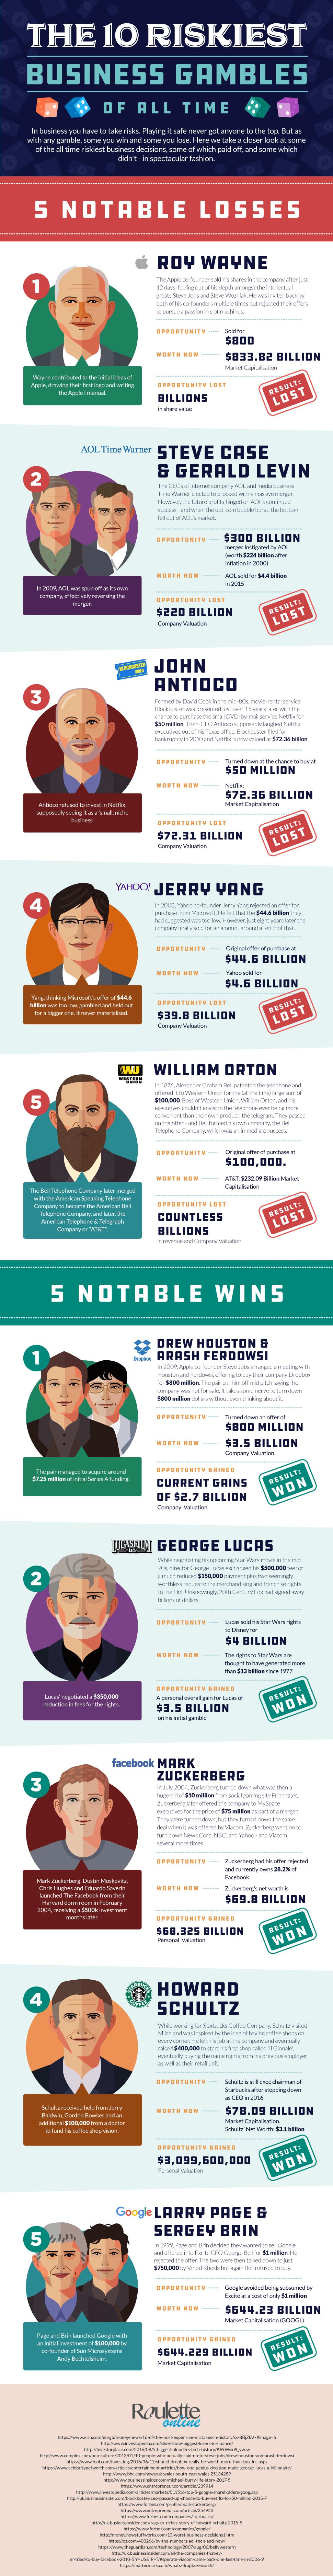 risky business gambles